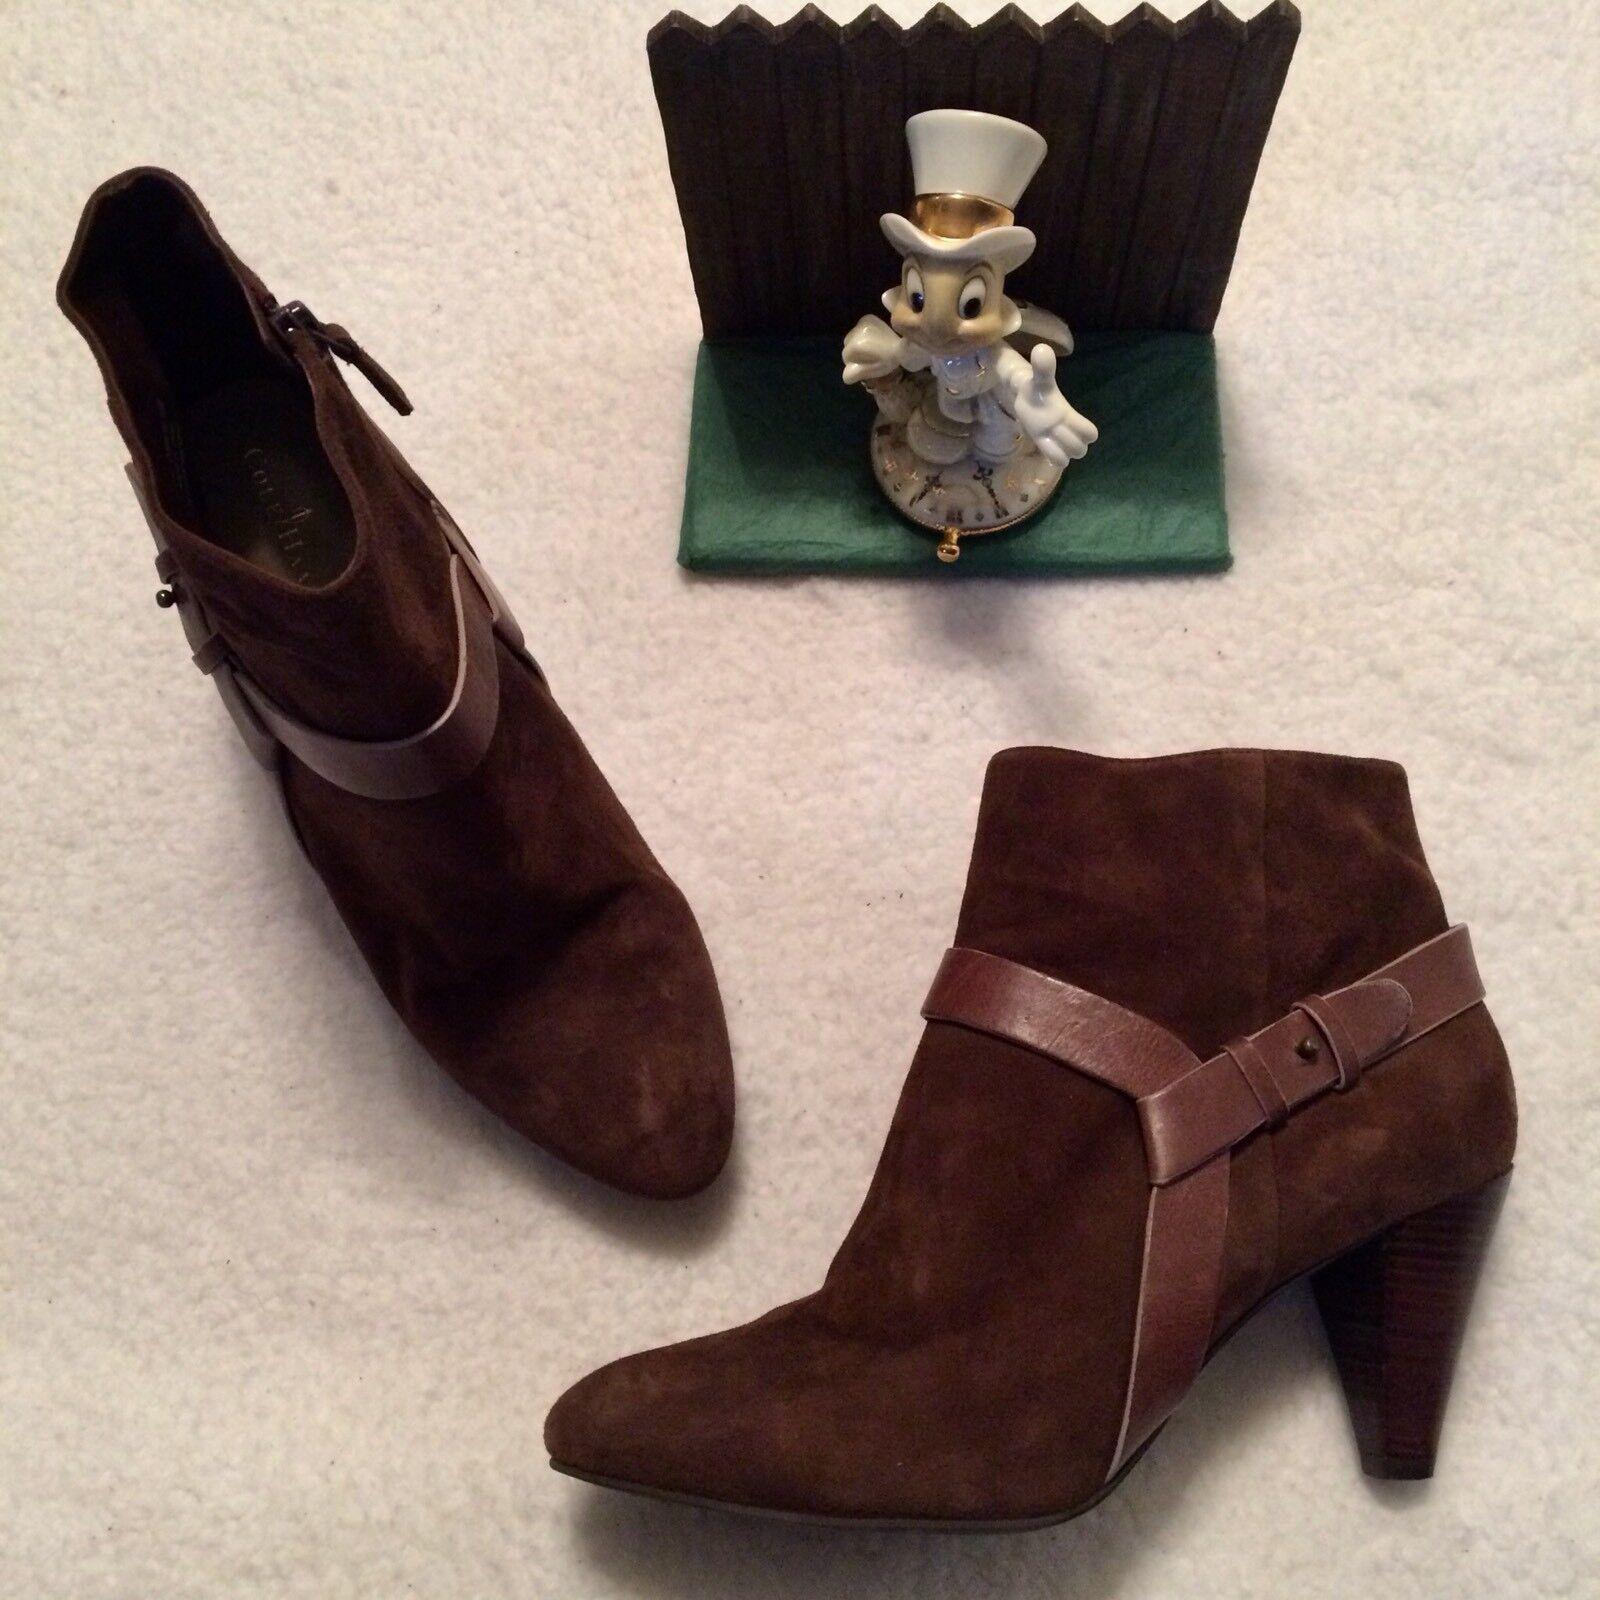 Cole Haan D38416 Booties Damenschuhe Stiefel Größe 10 B Braun Side Zip.. Minimal Wear..